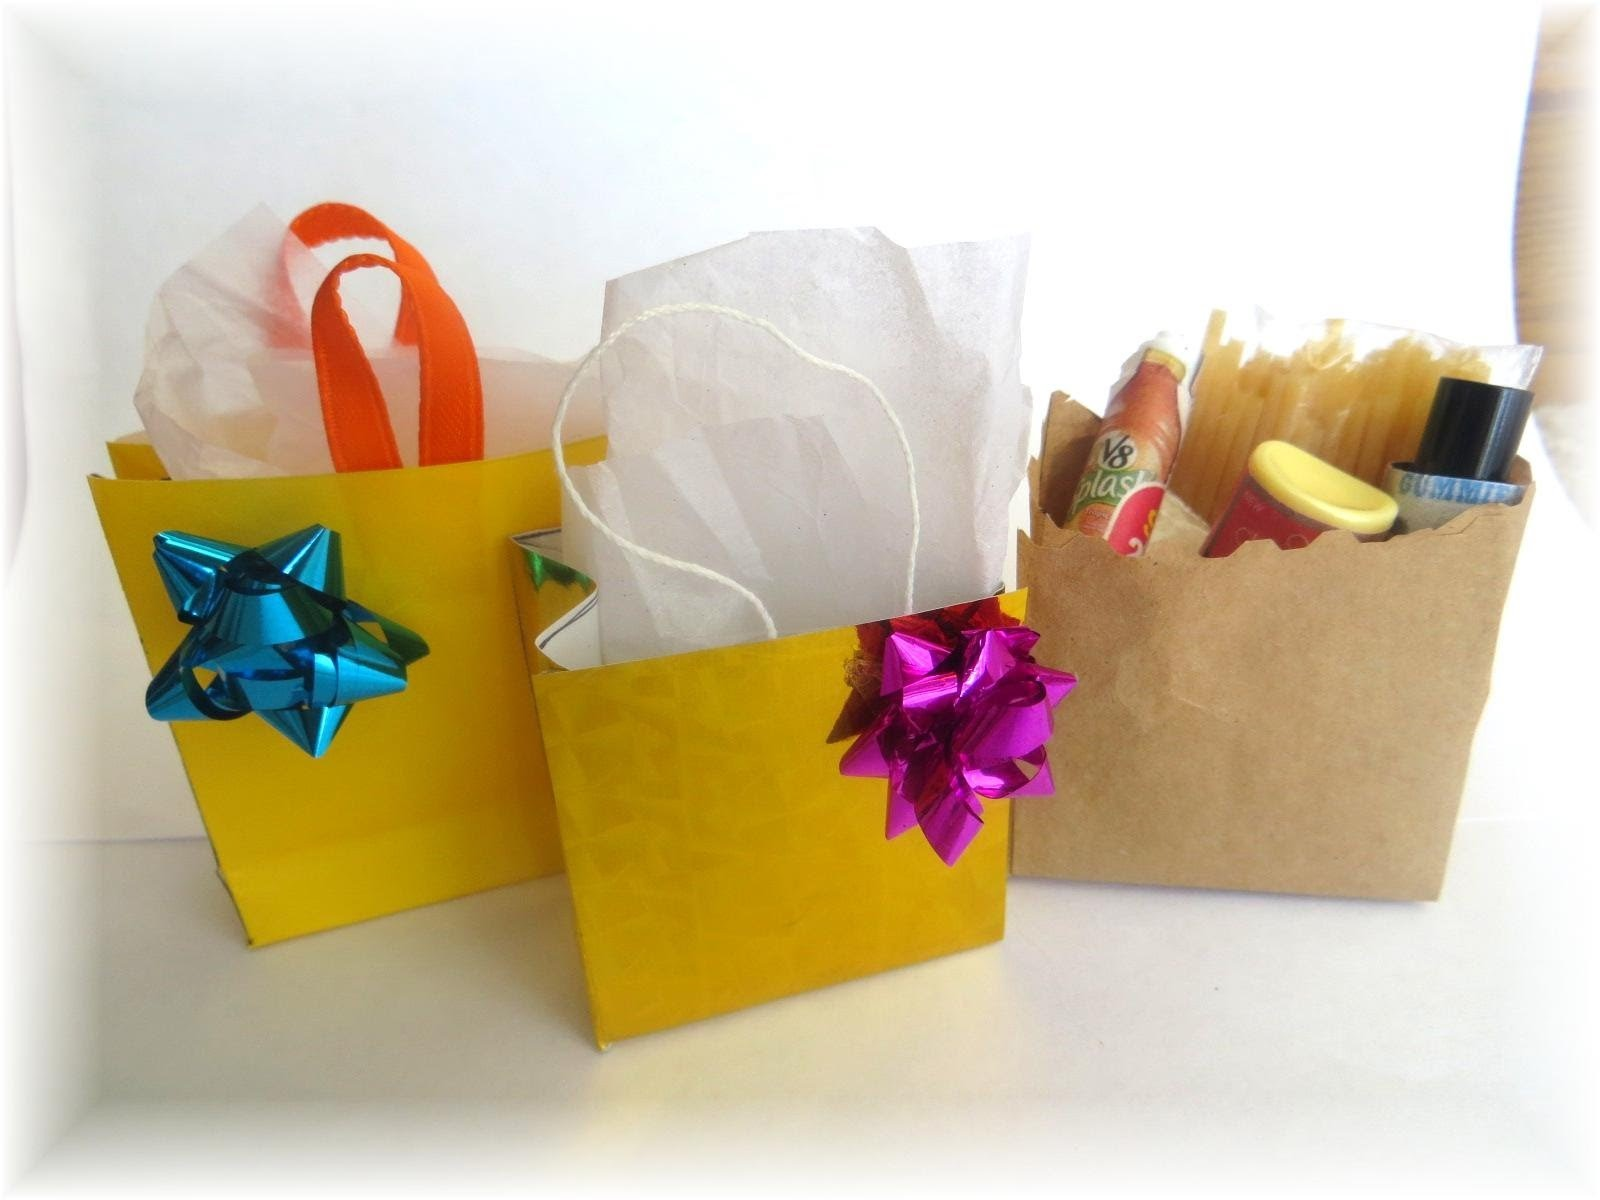 Cómo hacer bolsas de compras o regalo para muñecas. How to make doll sopping.gift bags